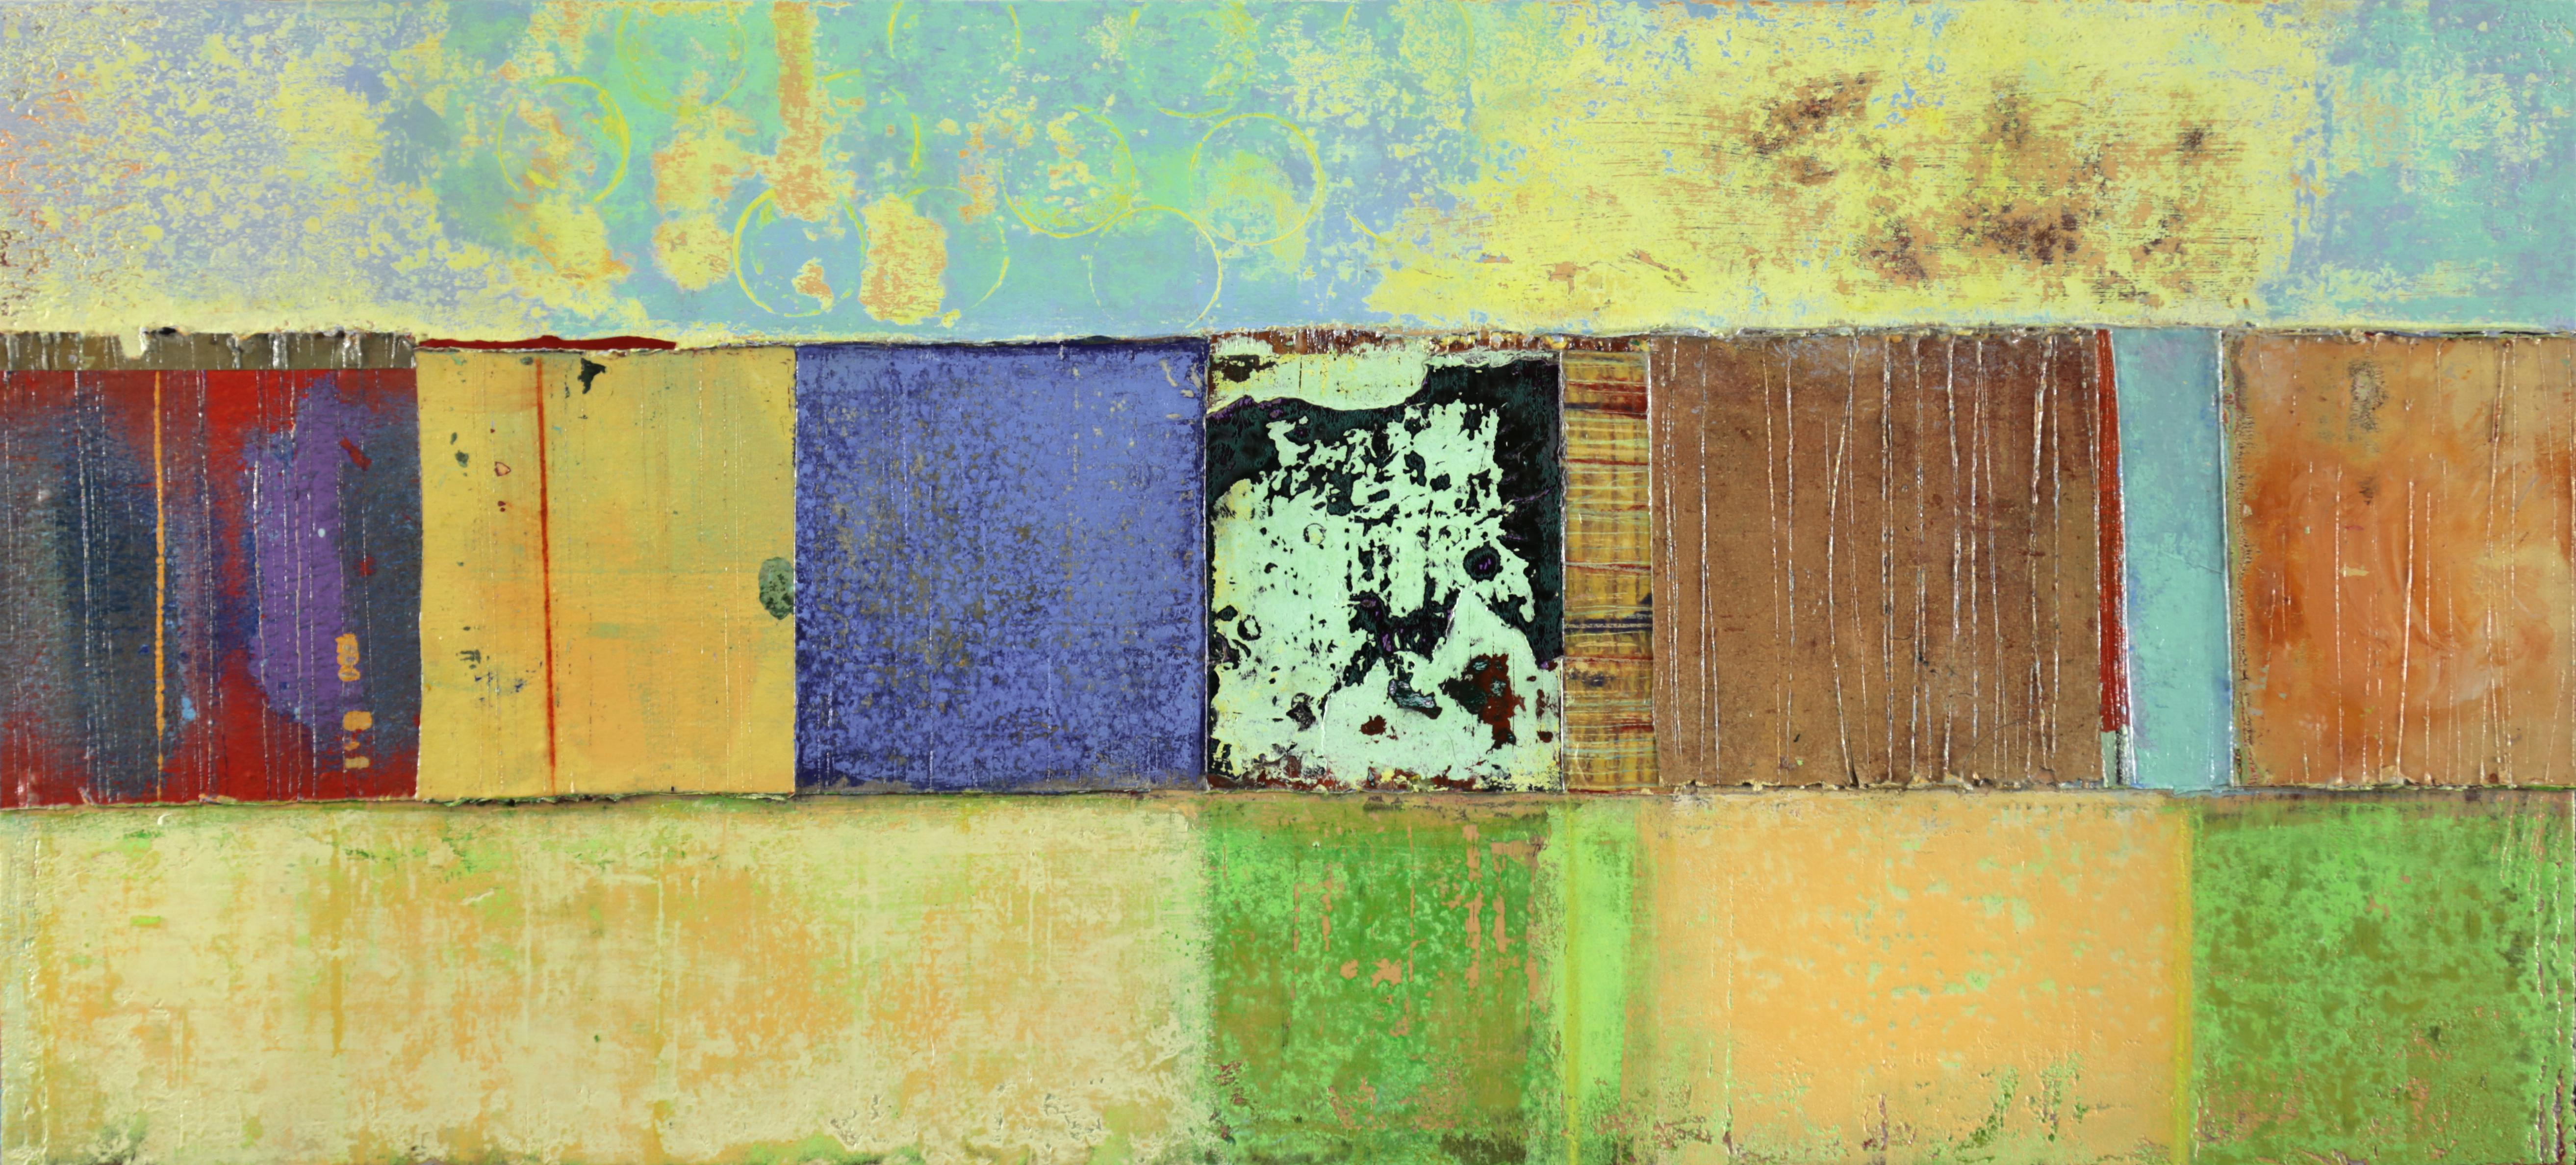 Wanton Composite X( private collection))